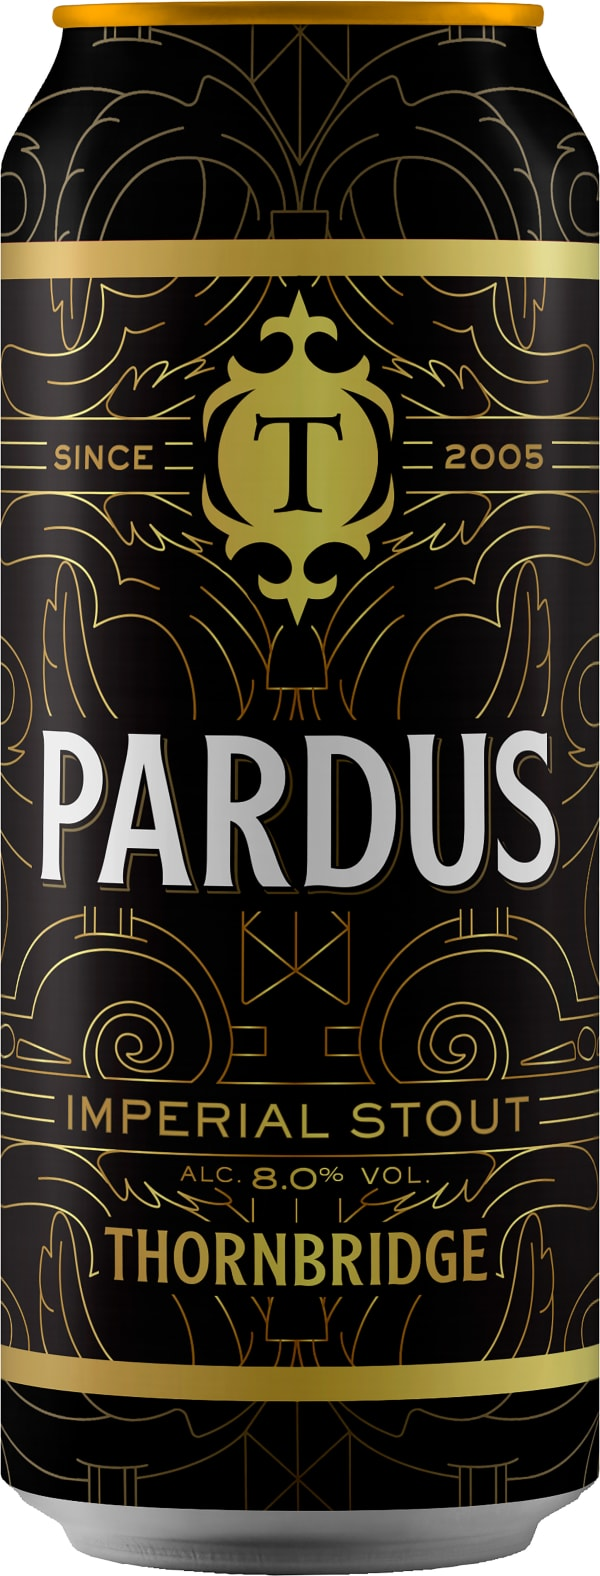 Thornbridge Pardus Imperial Stout burk